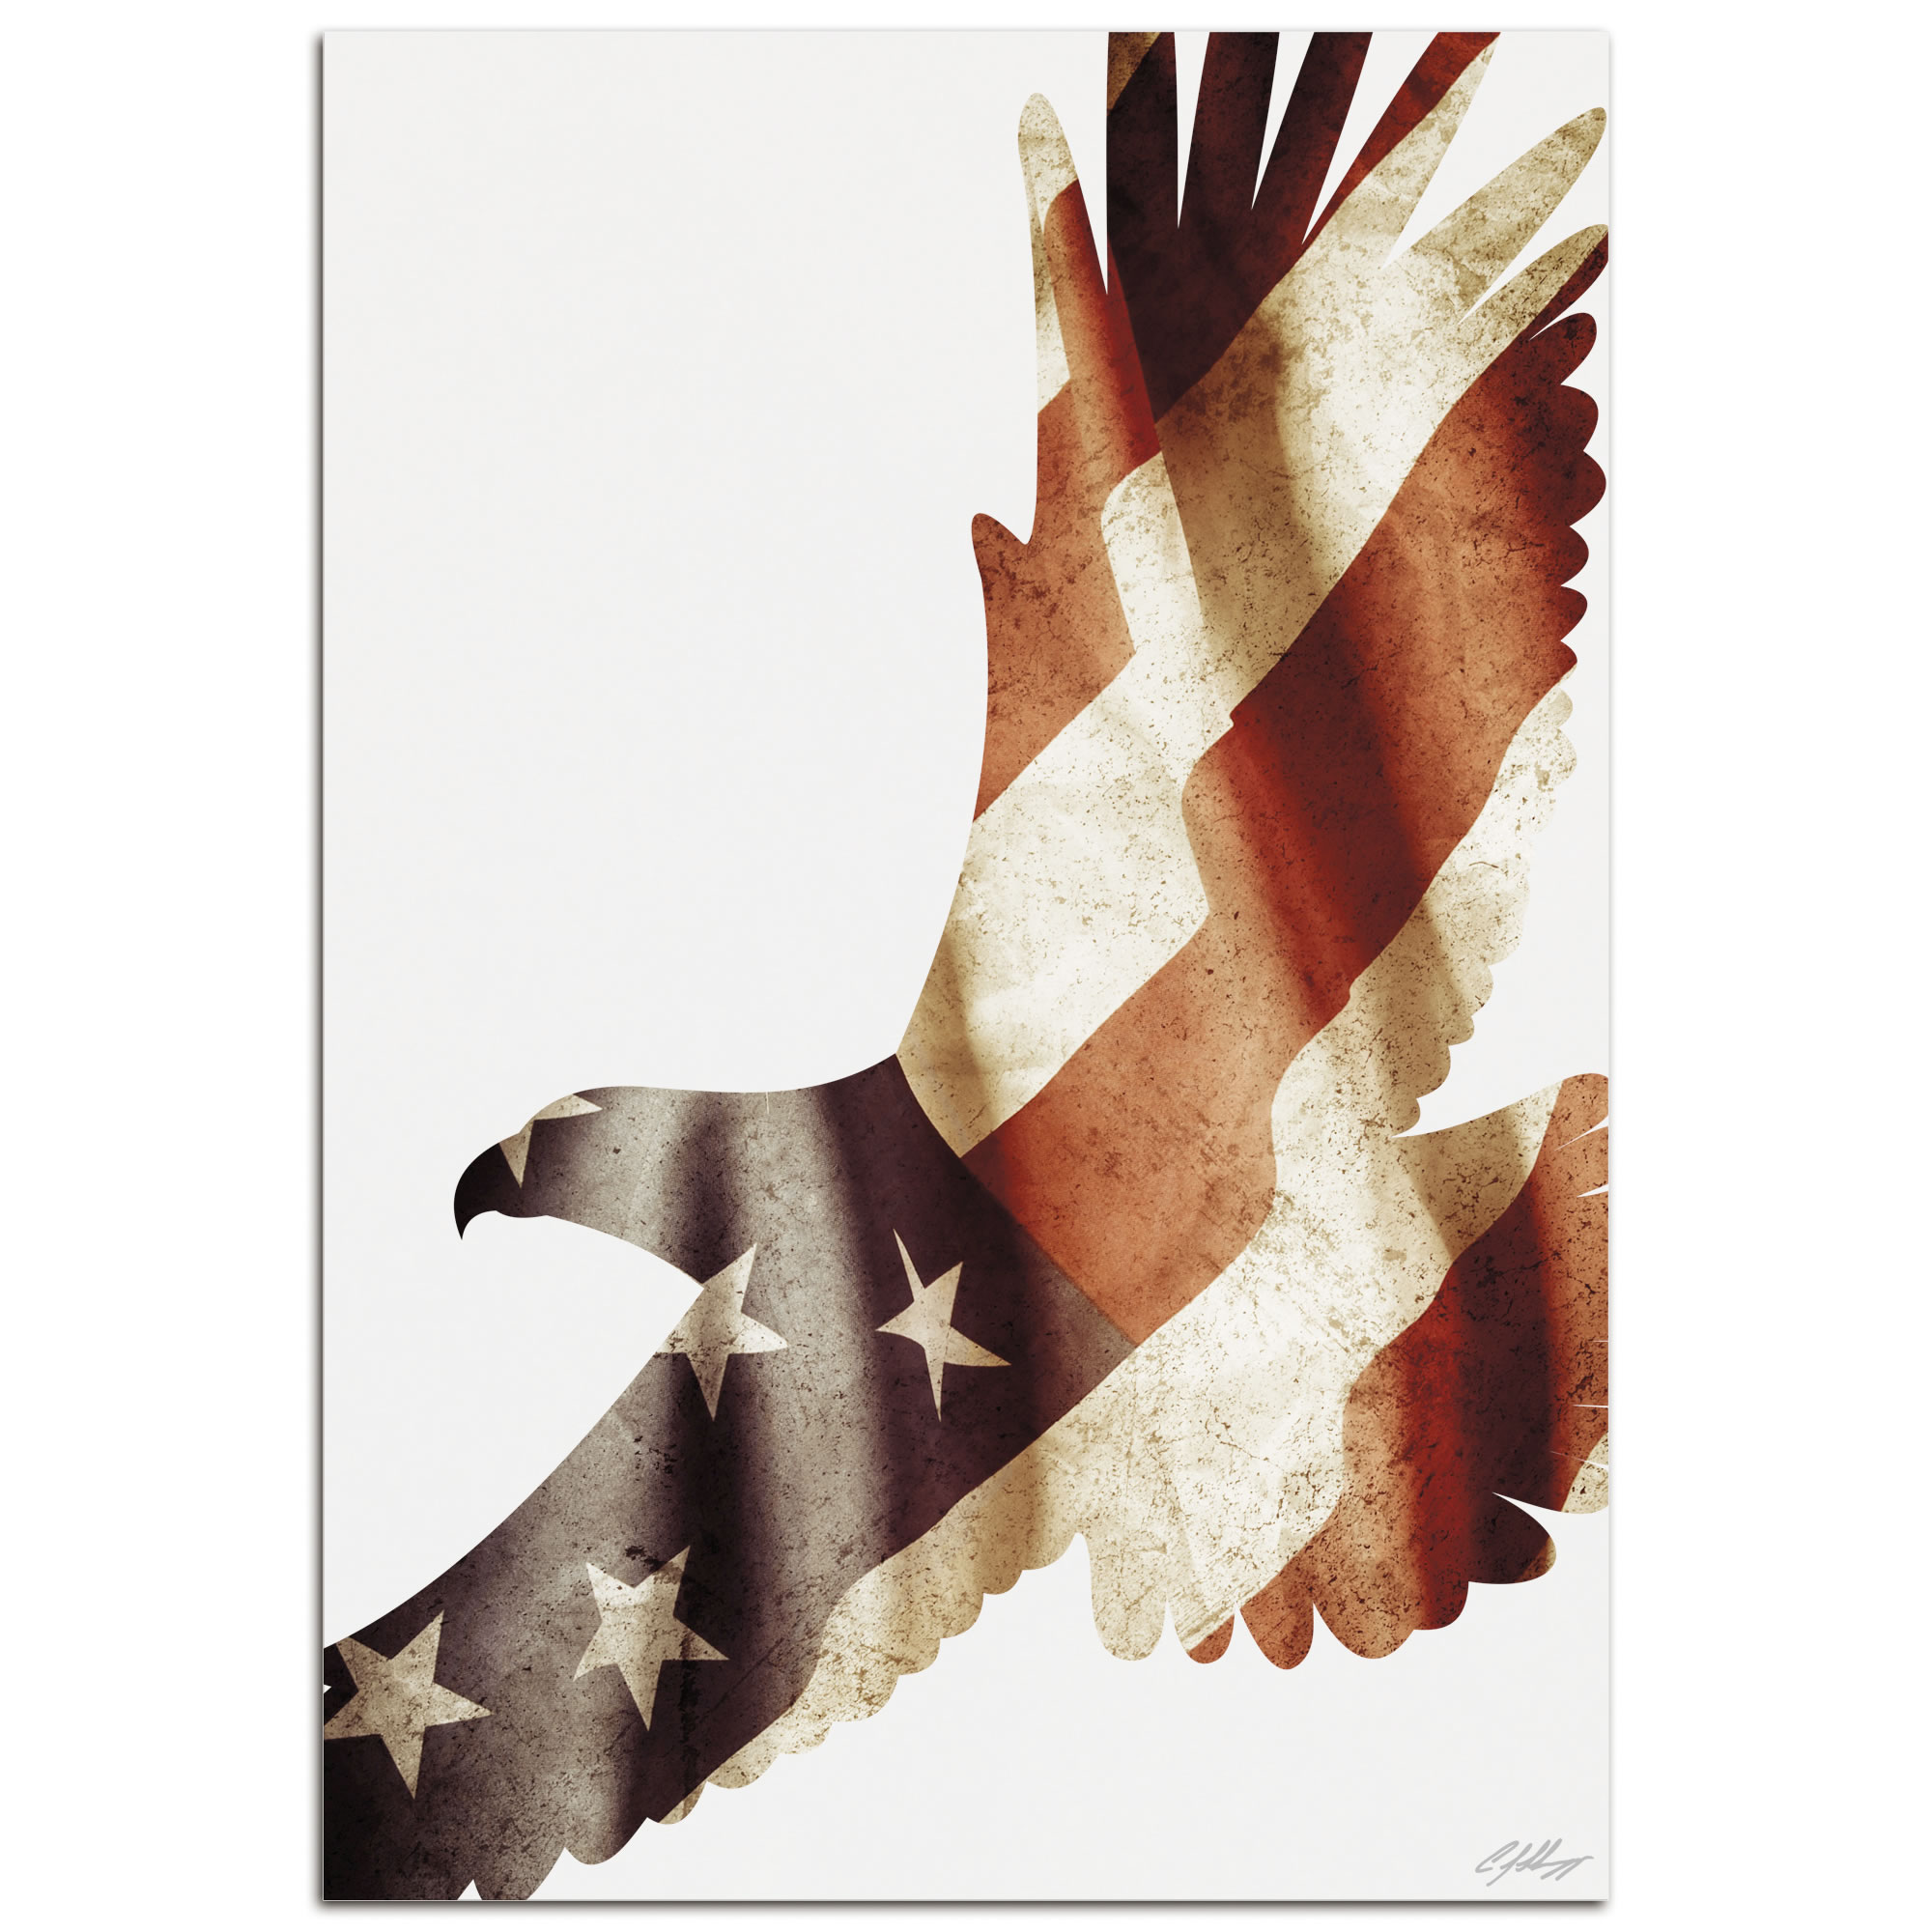 FREEDOM EAGLE - 32x22 in. Metal US Flag Print